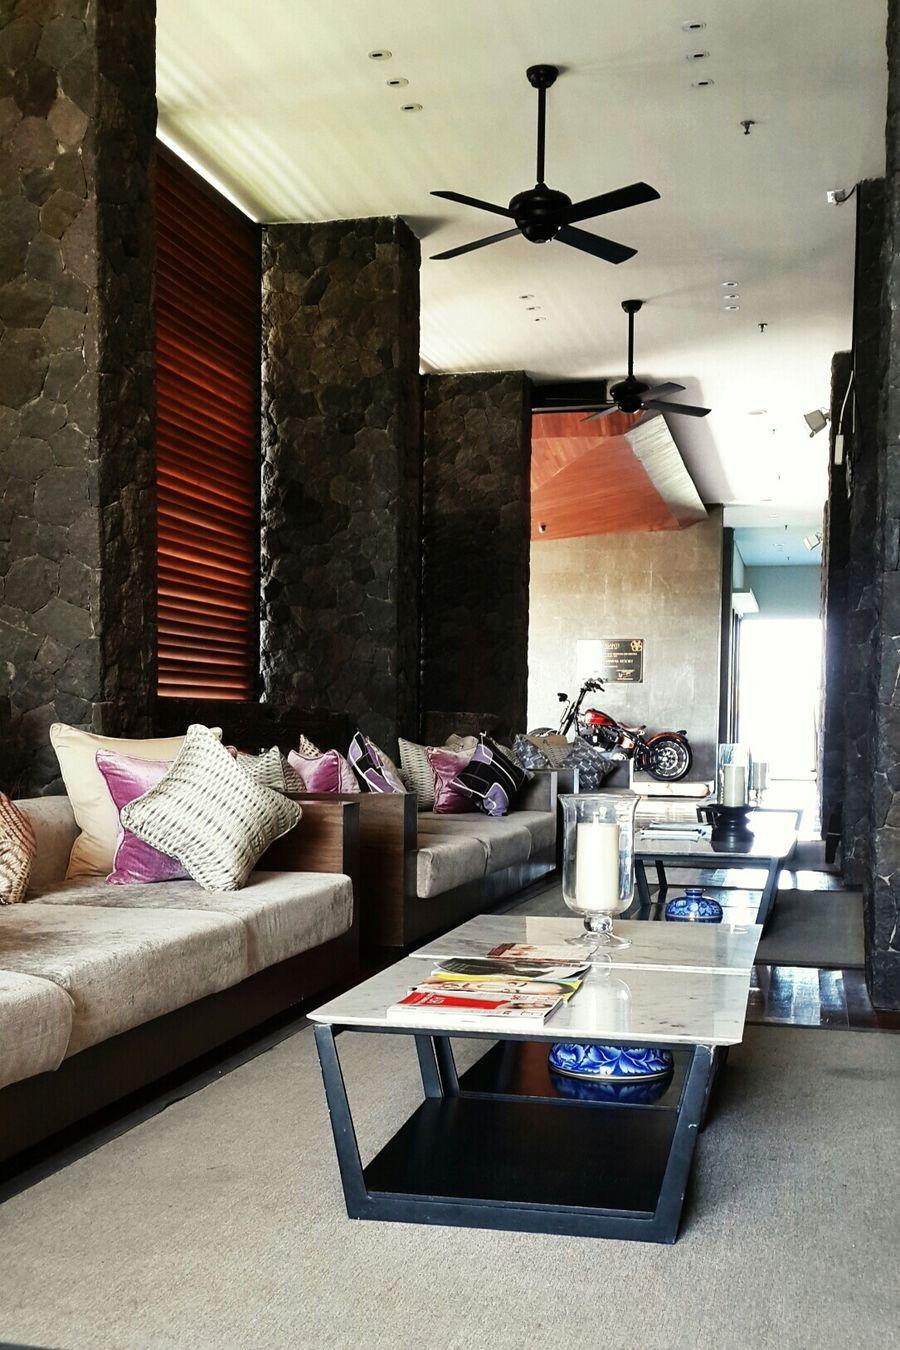 Lobby lounge Hotel Lobby Relaxing Time Interior Design Seminyak Bali